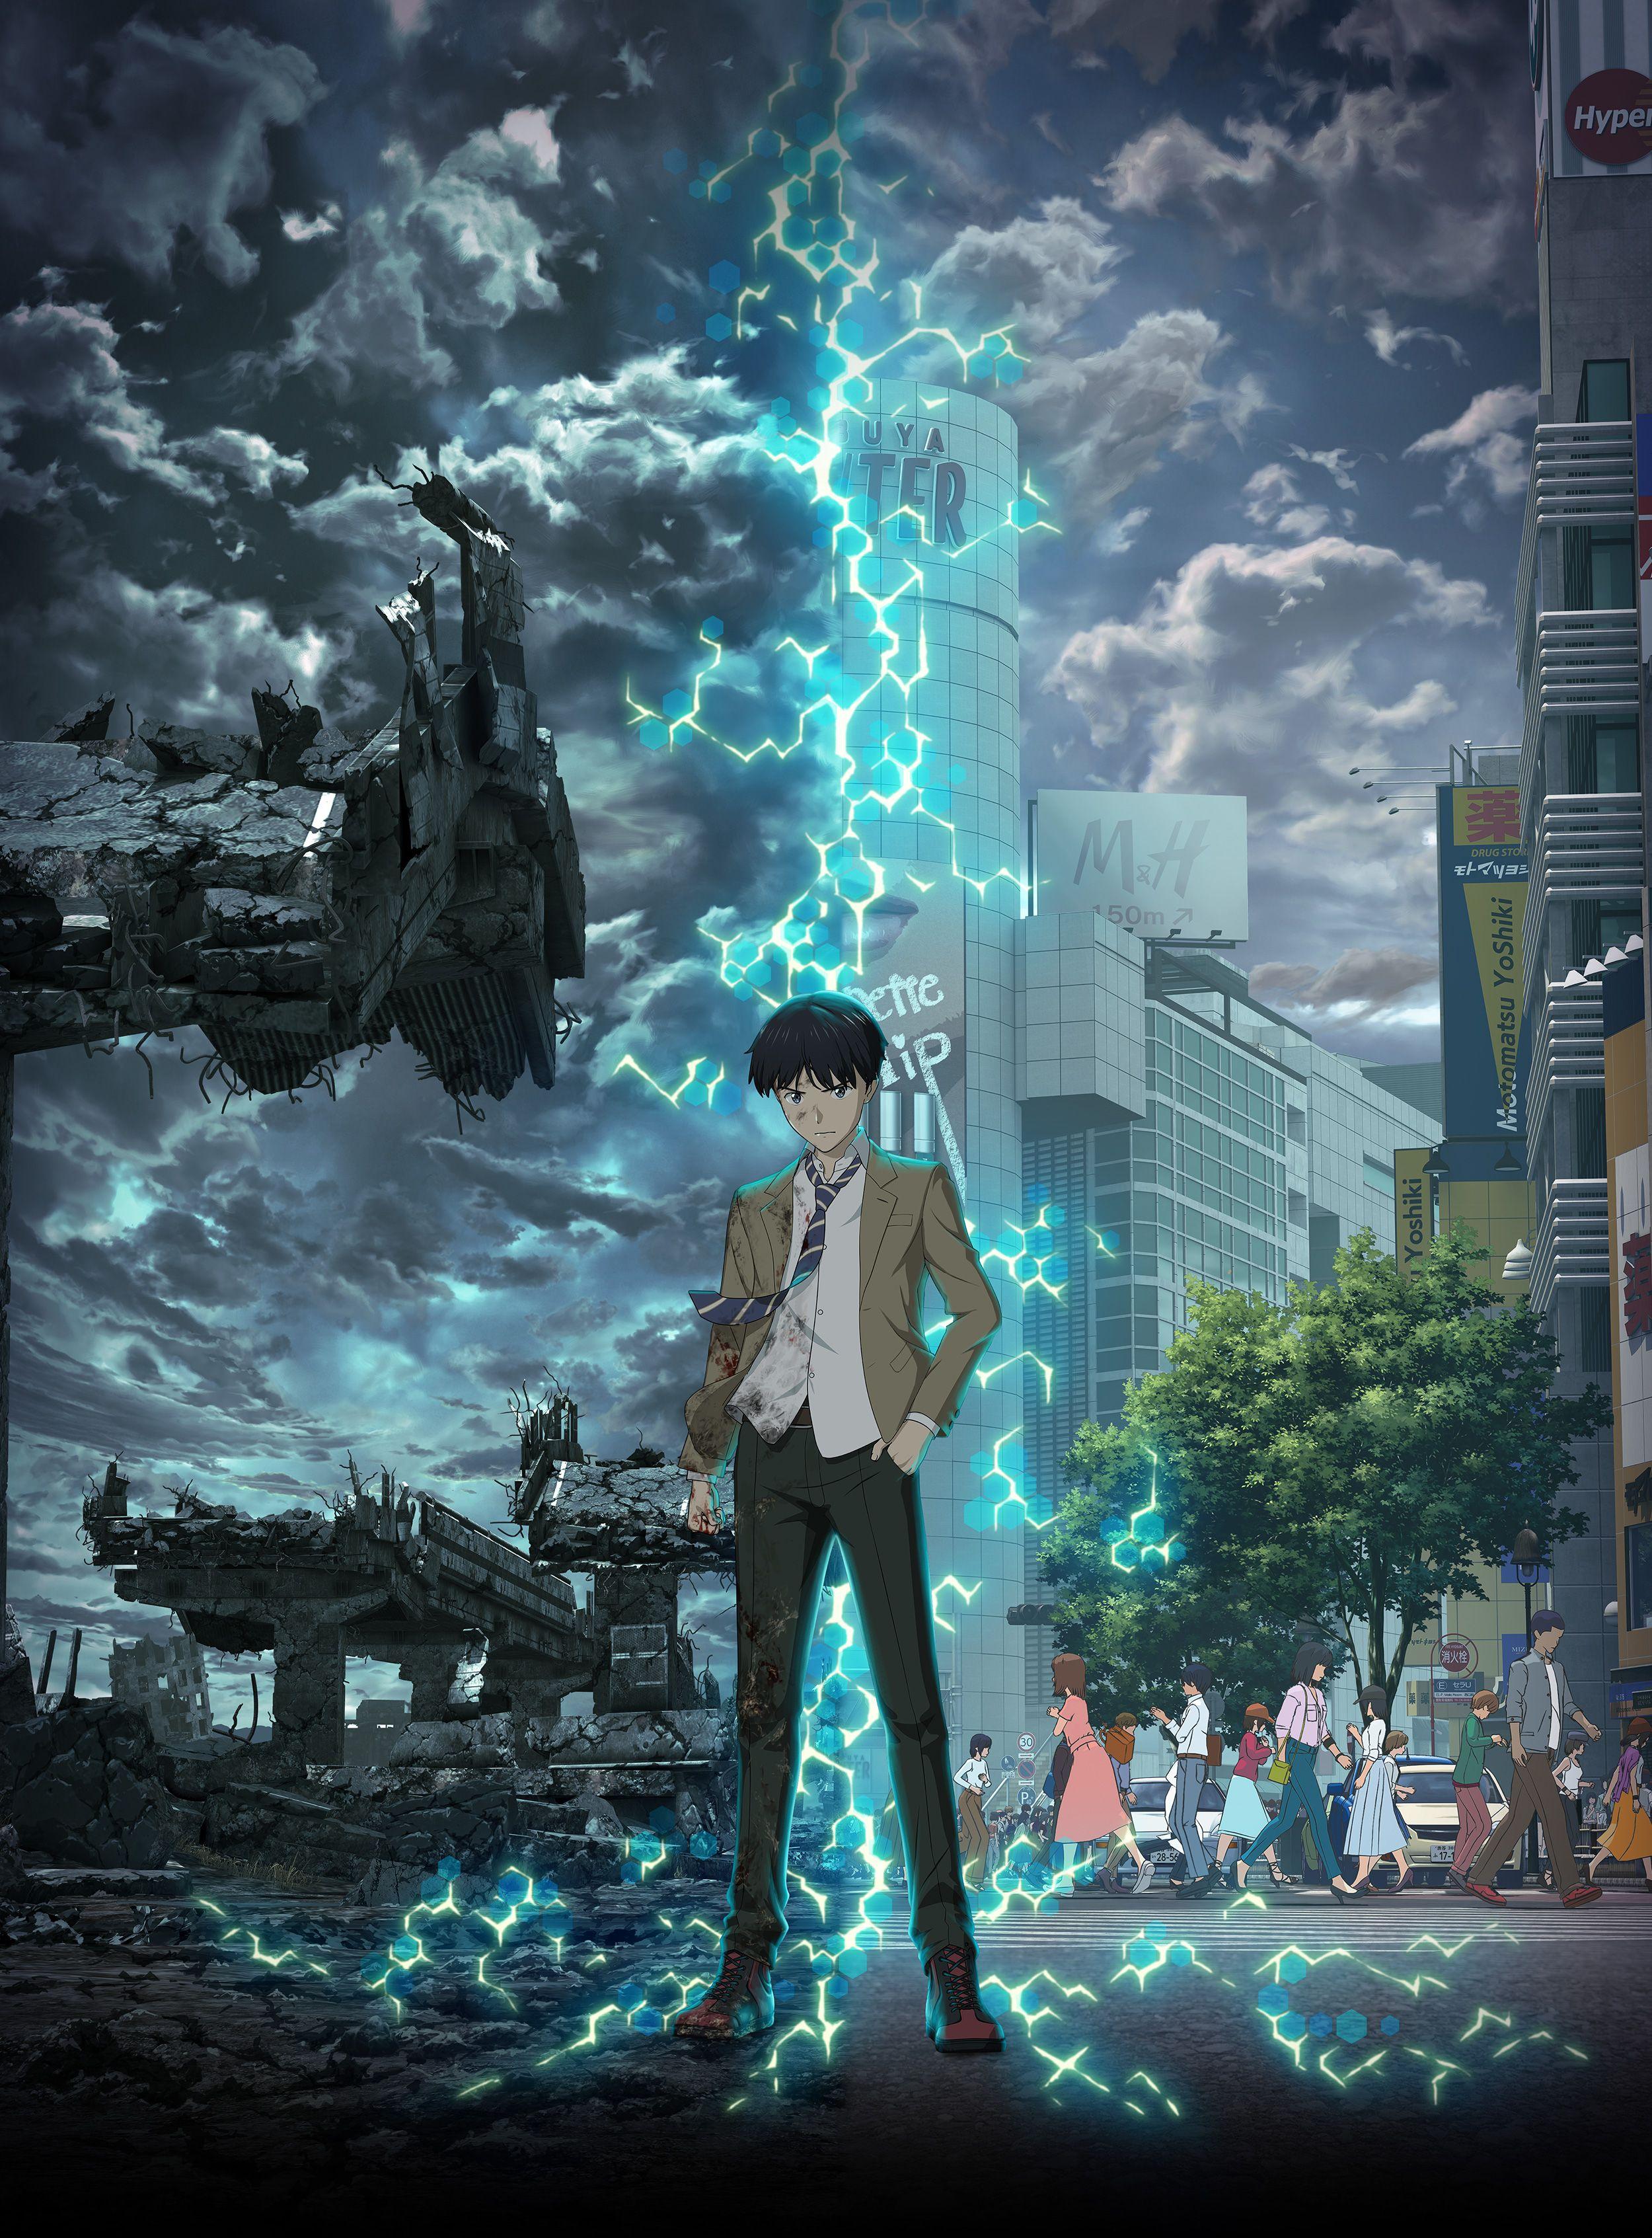 TVアニメ「revisions リヴィジョンズ」公式サイト アニメ, 中二病, 設定画